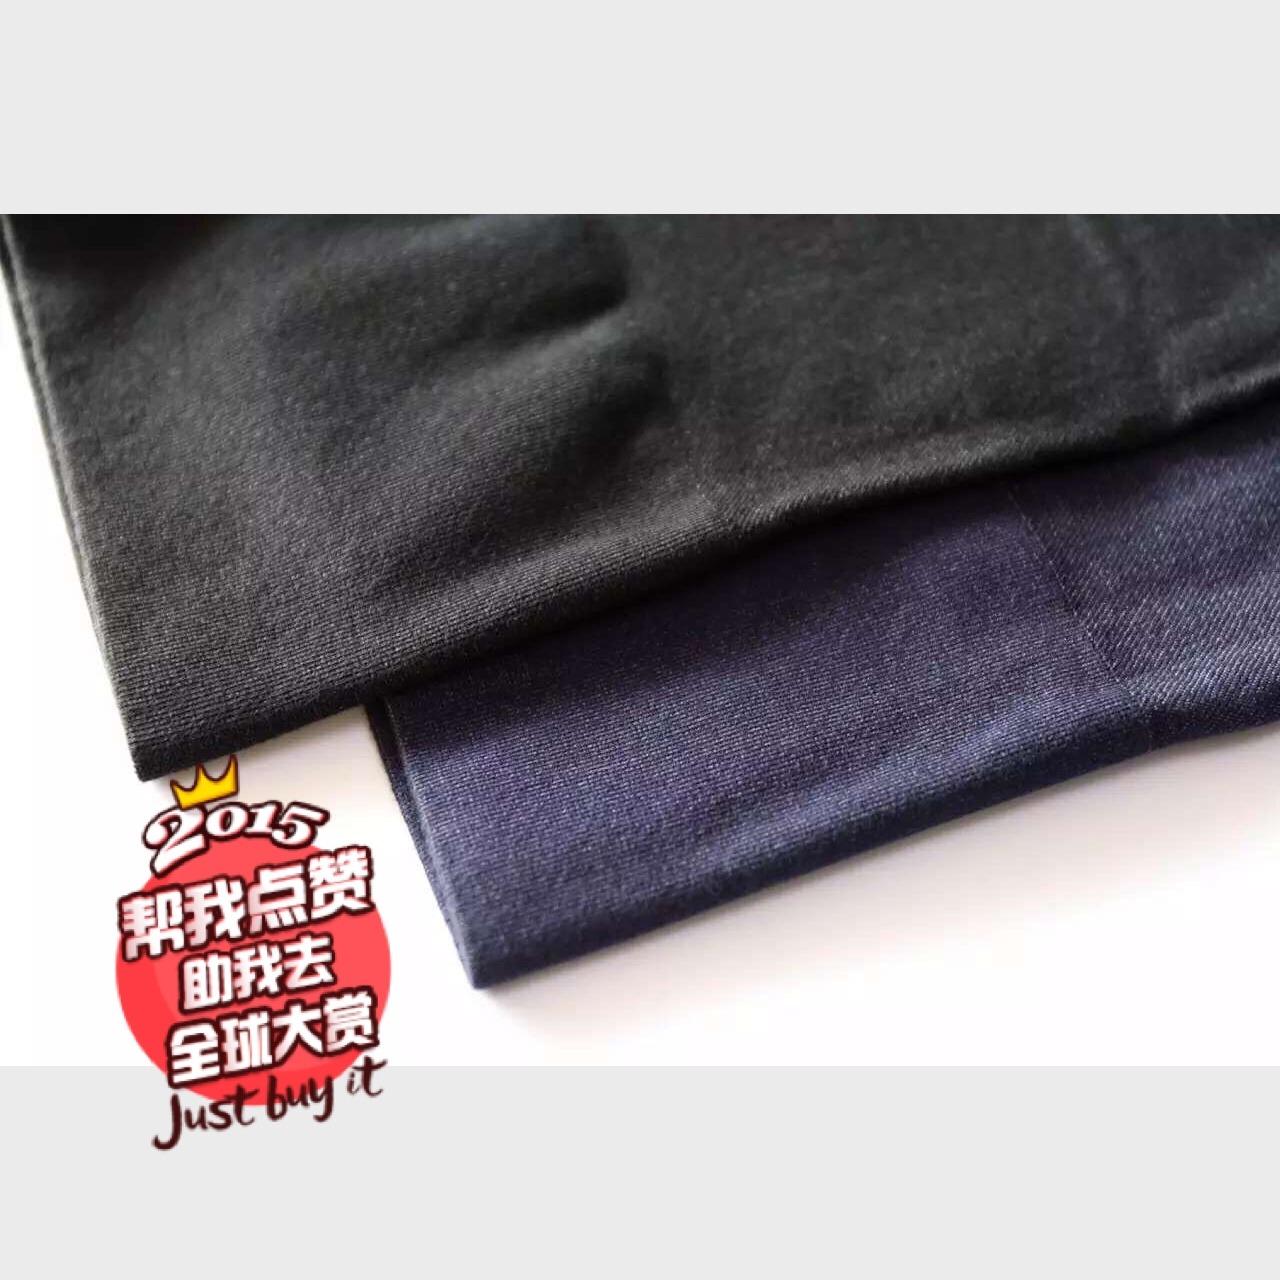 spanx美国老牌塑身衣品牌